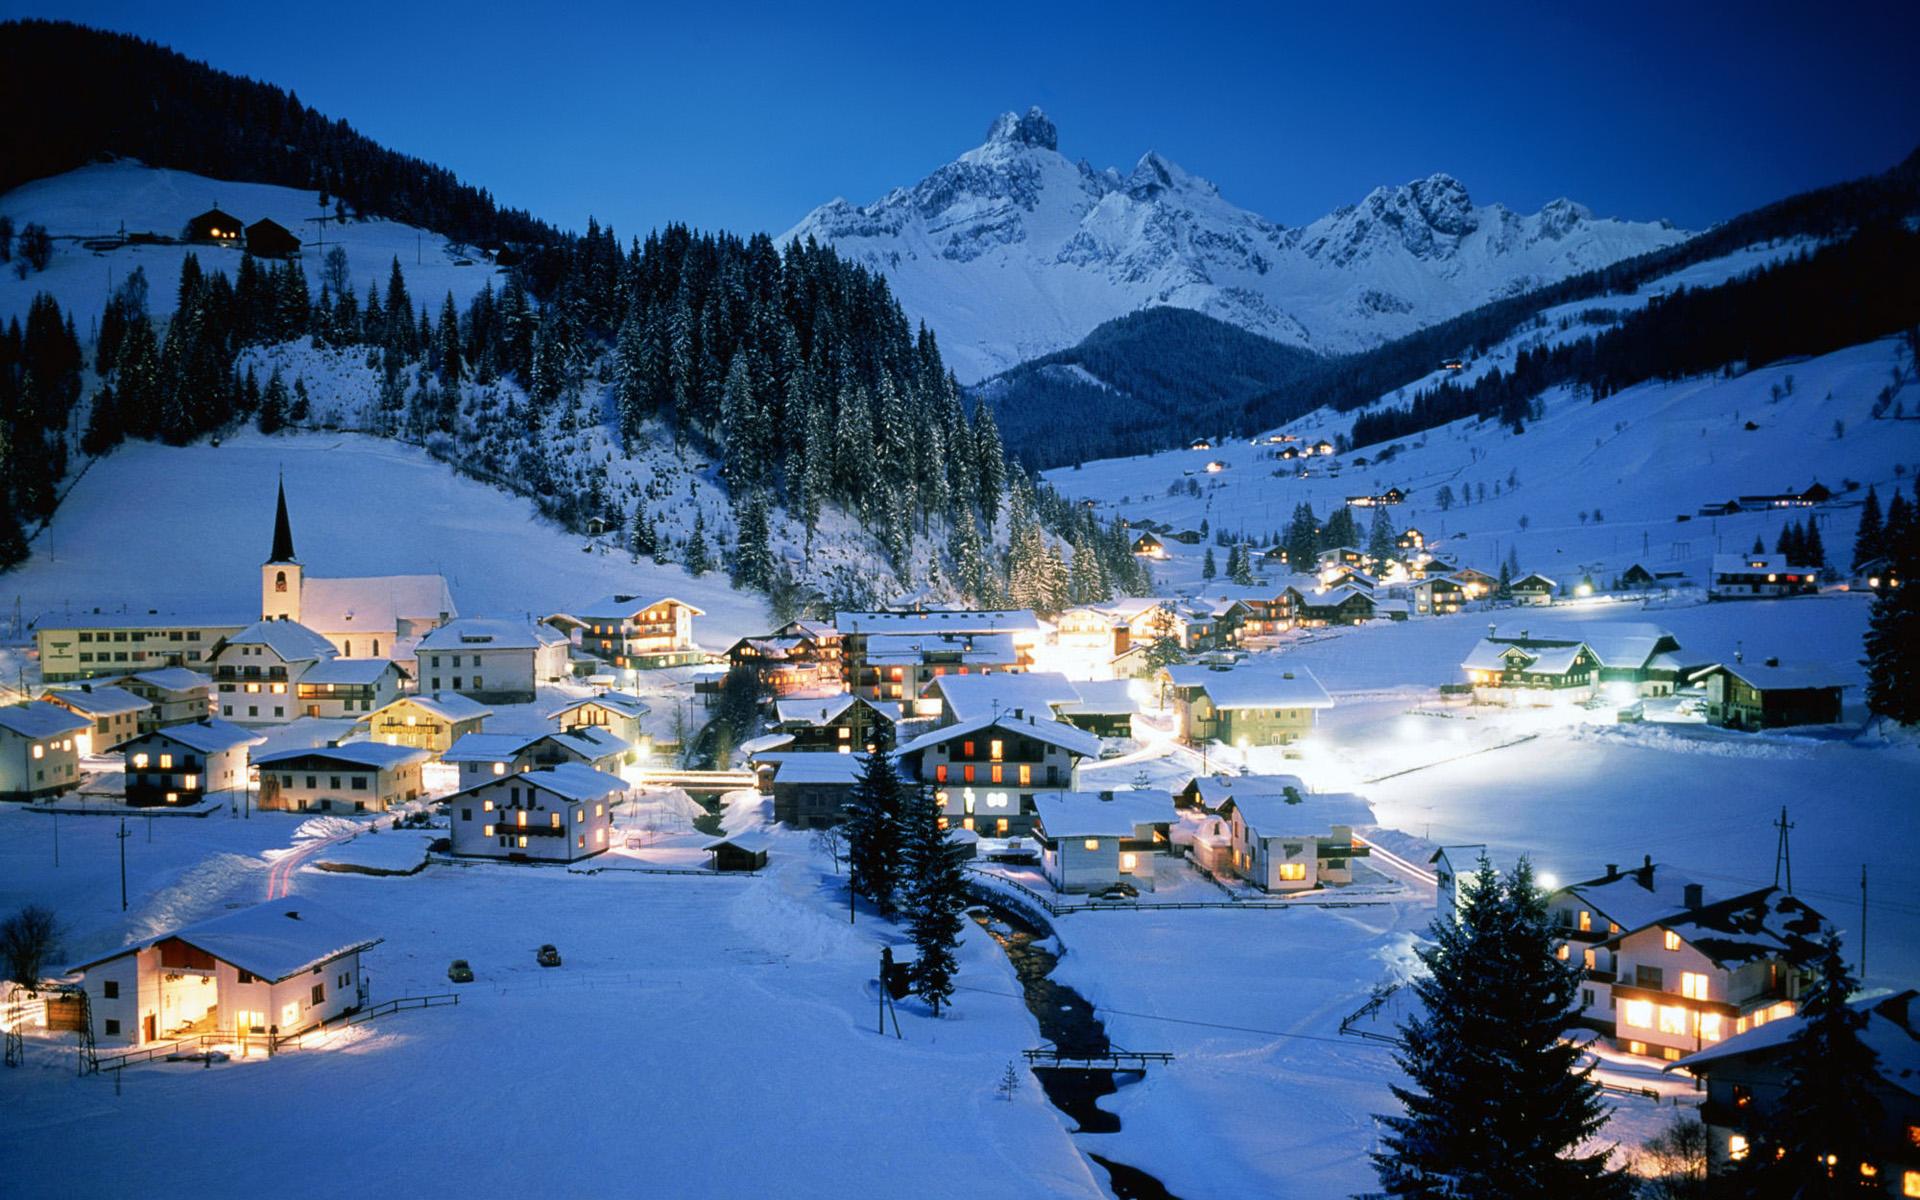 Mountain Wallpaper In Snow